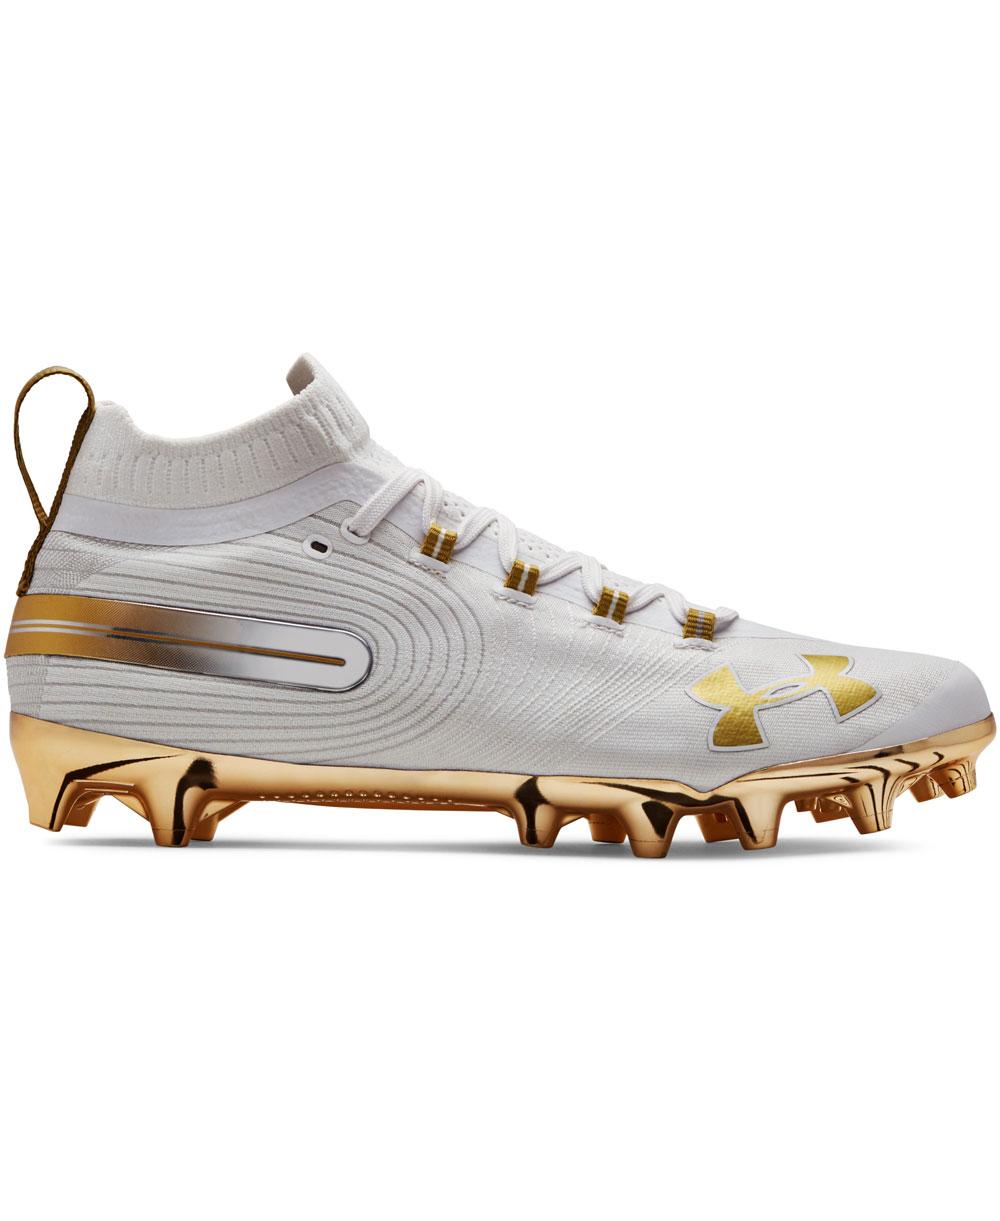 9bf869eb2 Under Armour Spotlight MC Zapatos de Fútbol Americano para Hombre W...